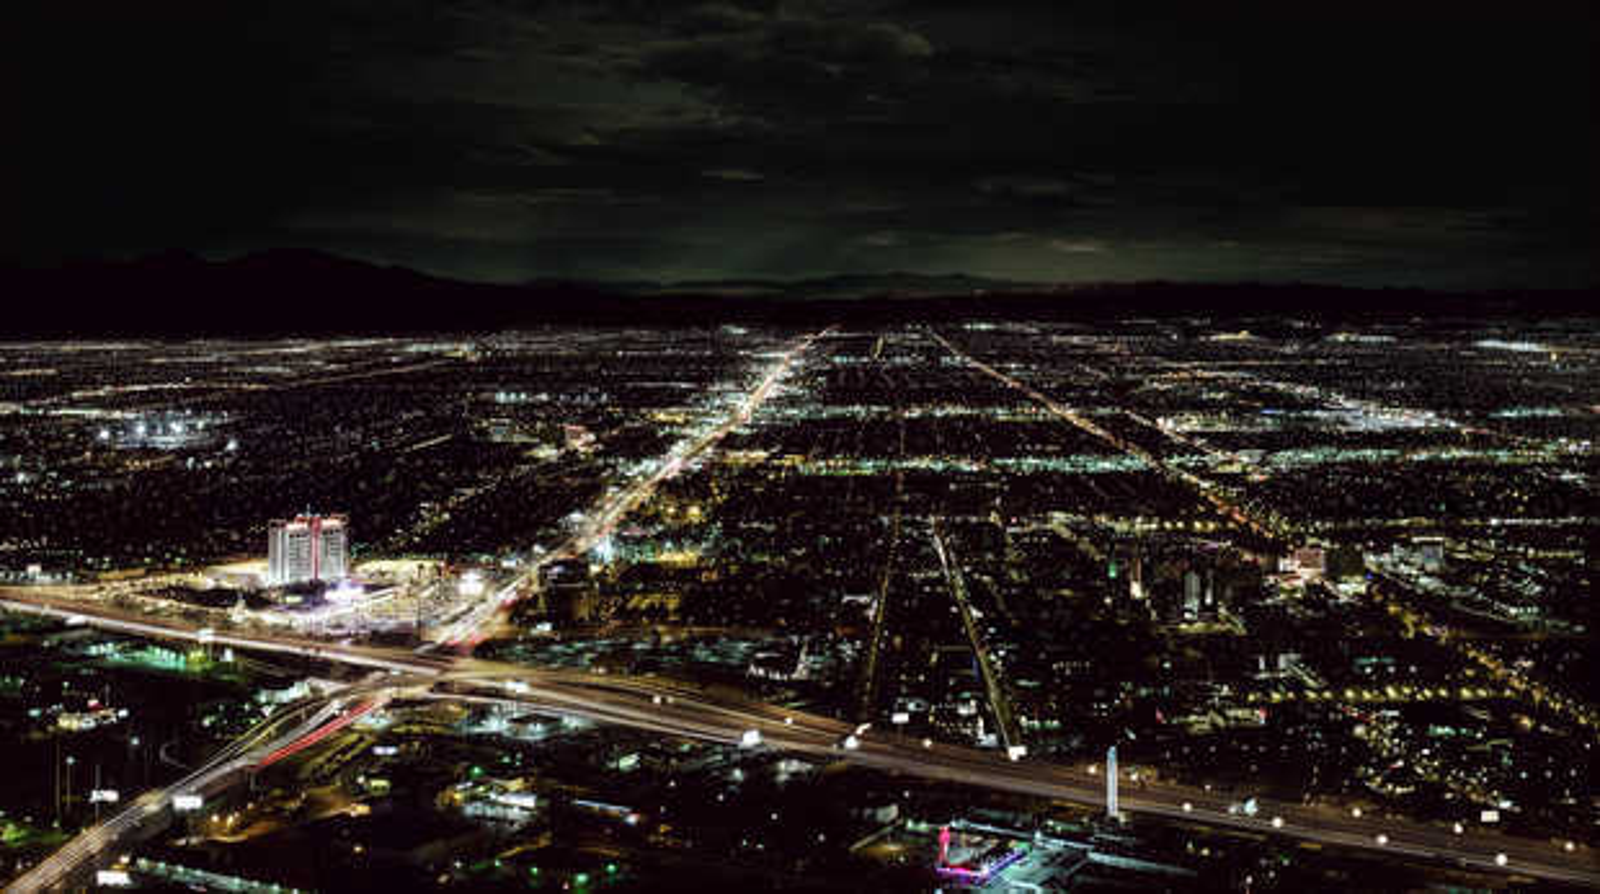 Vegas 2 - Christian Stoll